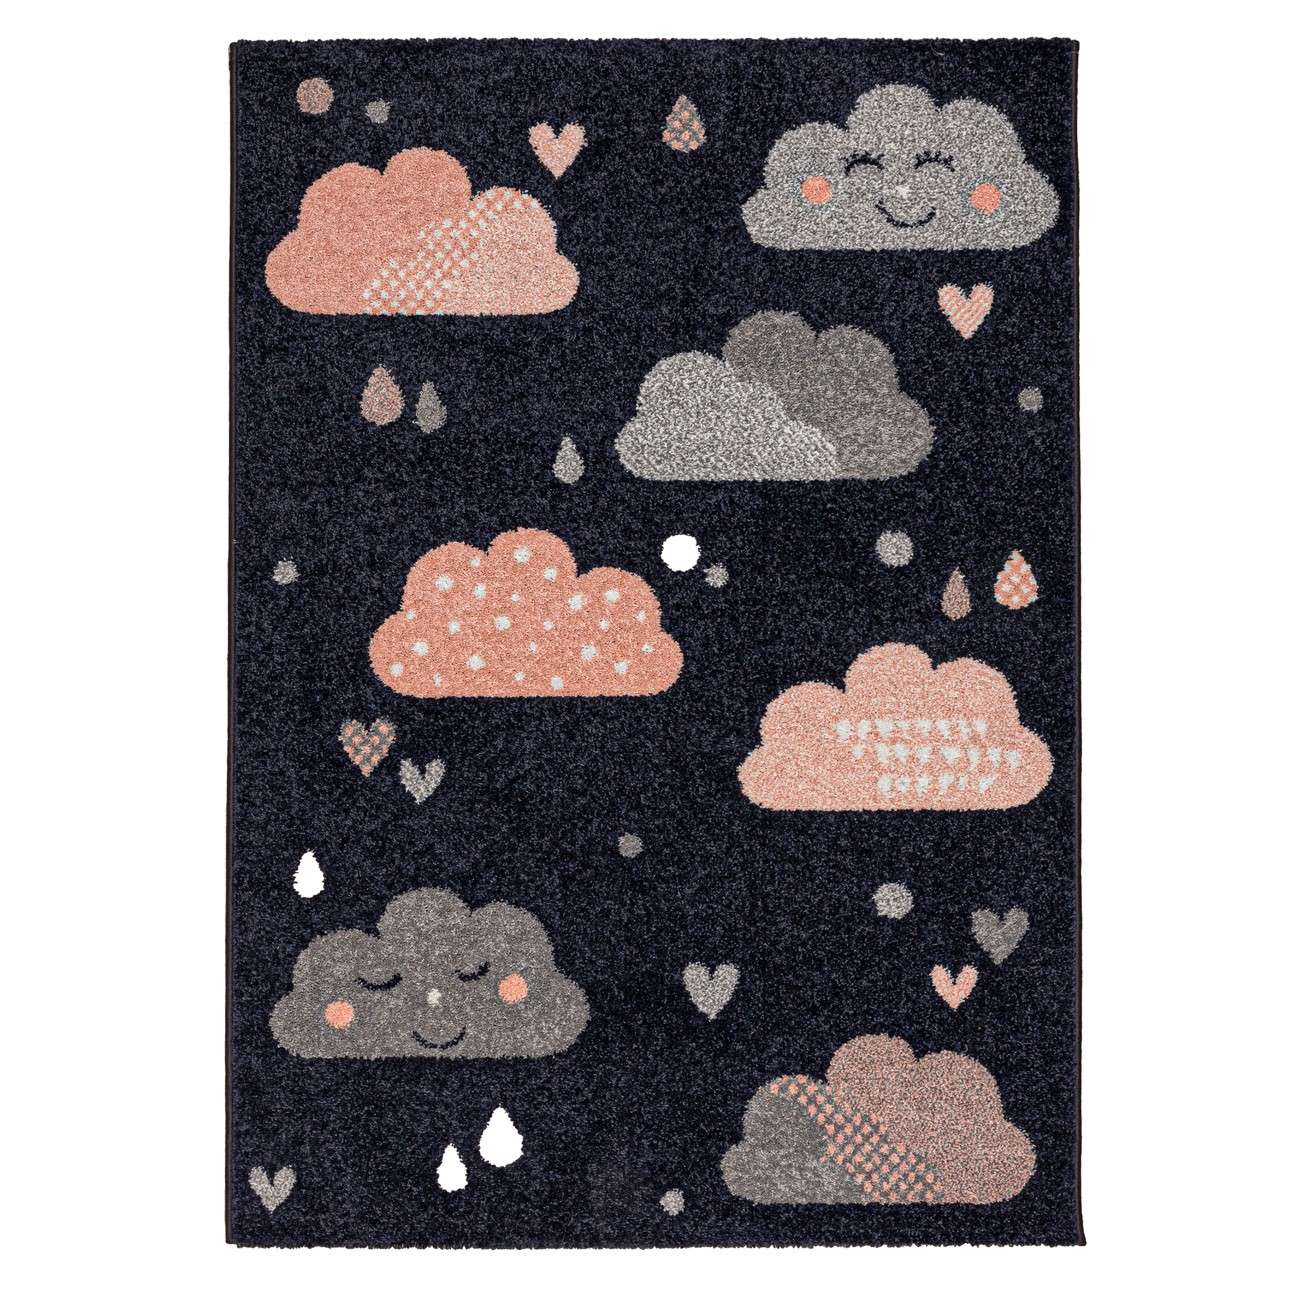 Koberec Summer Rain 160x230 cm